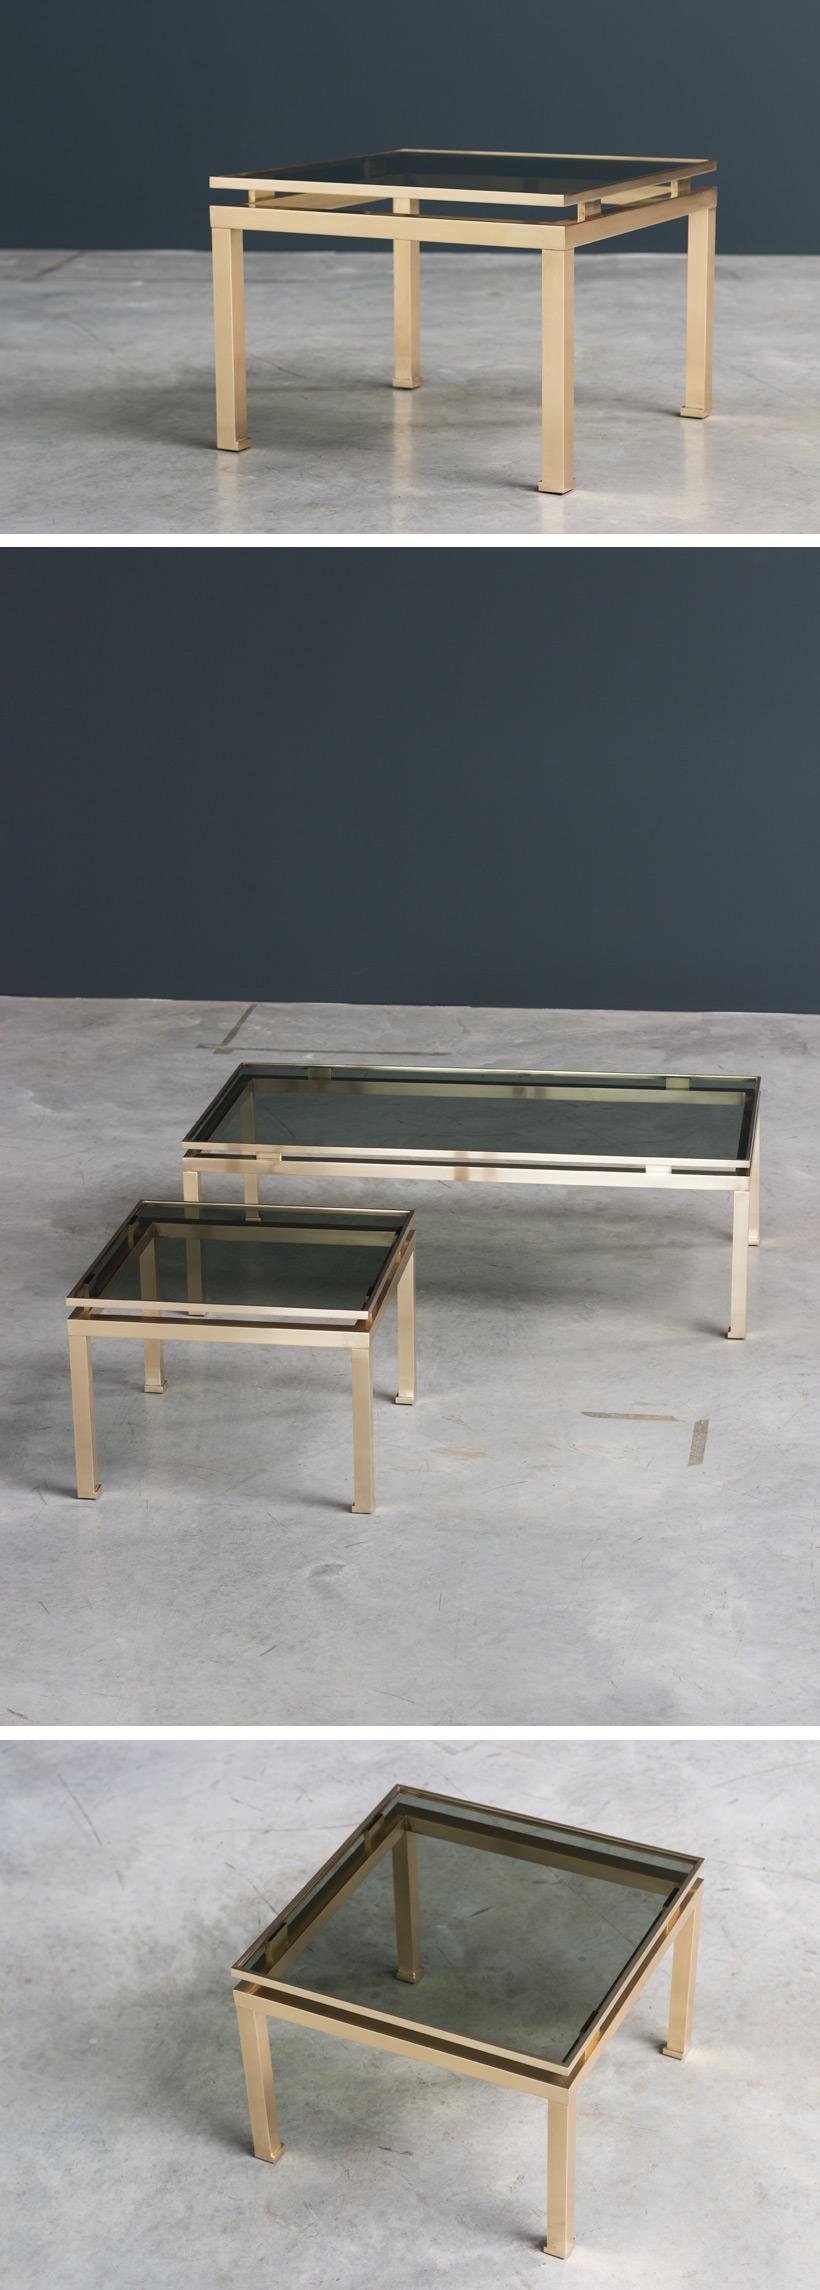 Guy Lefevre side table Maison Jansen 1970 Large